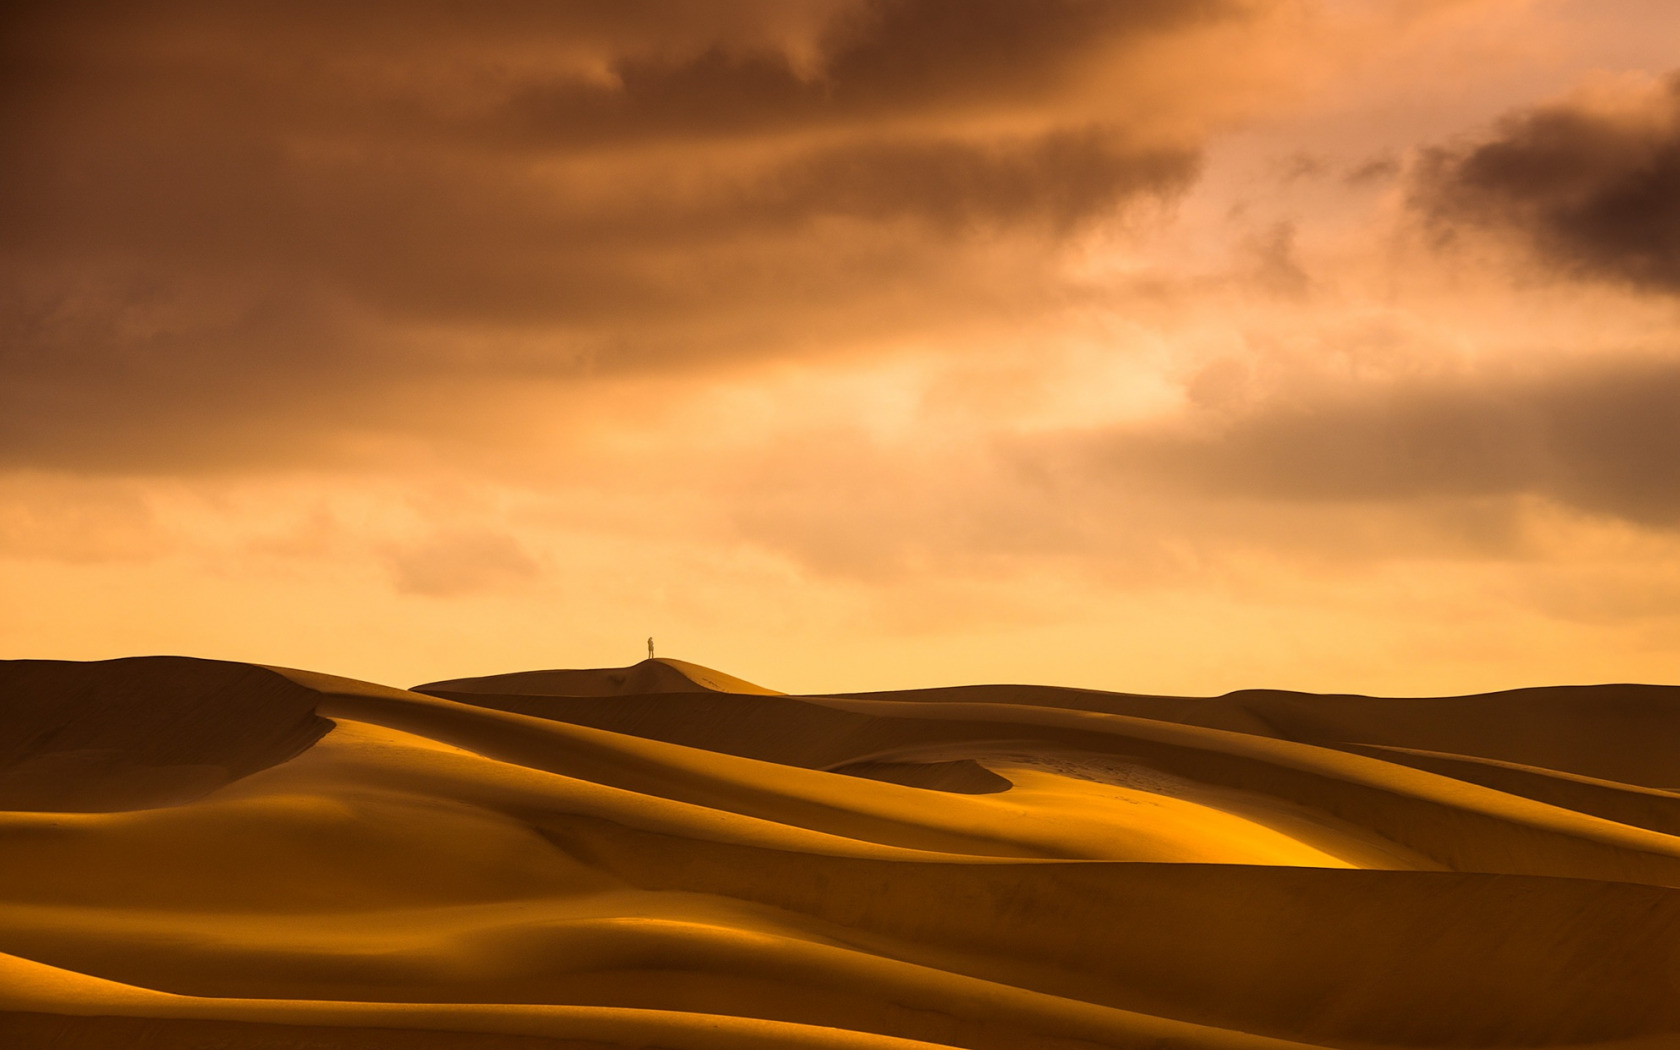 картинки небо пустыни транспортное средство китае